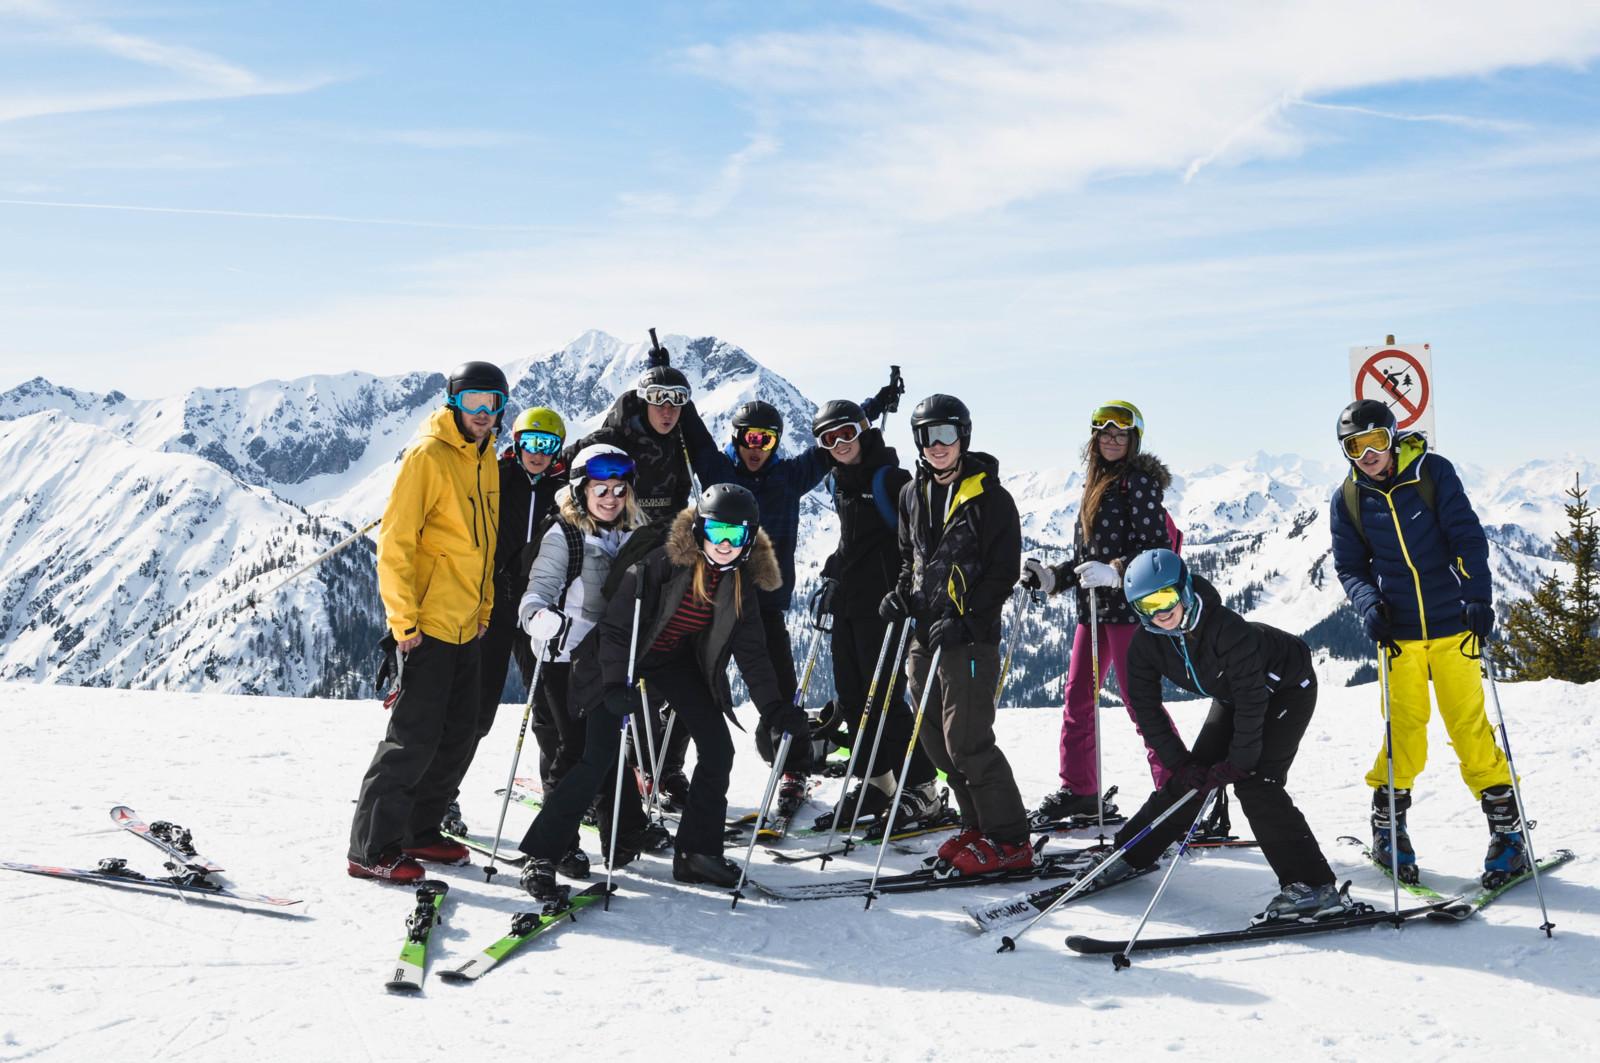 [2022] Snowboarden in skiparadijs Obertauern - Krokus - Obertauern